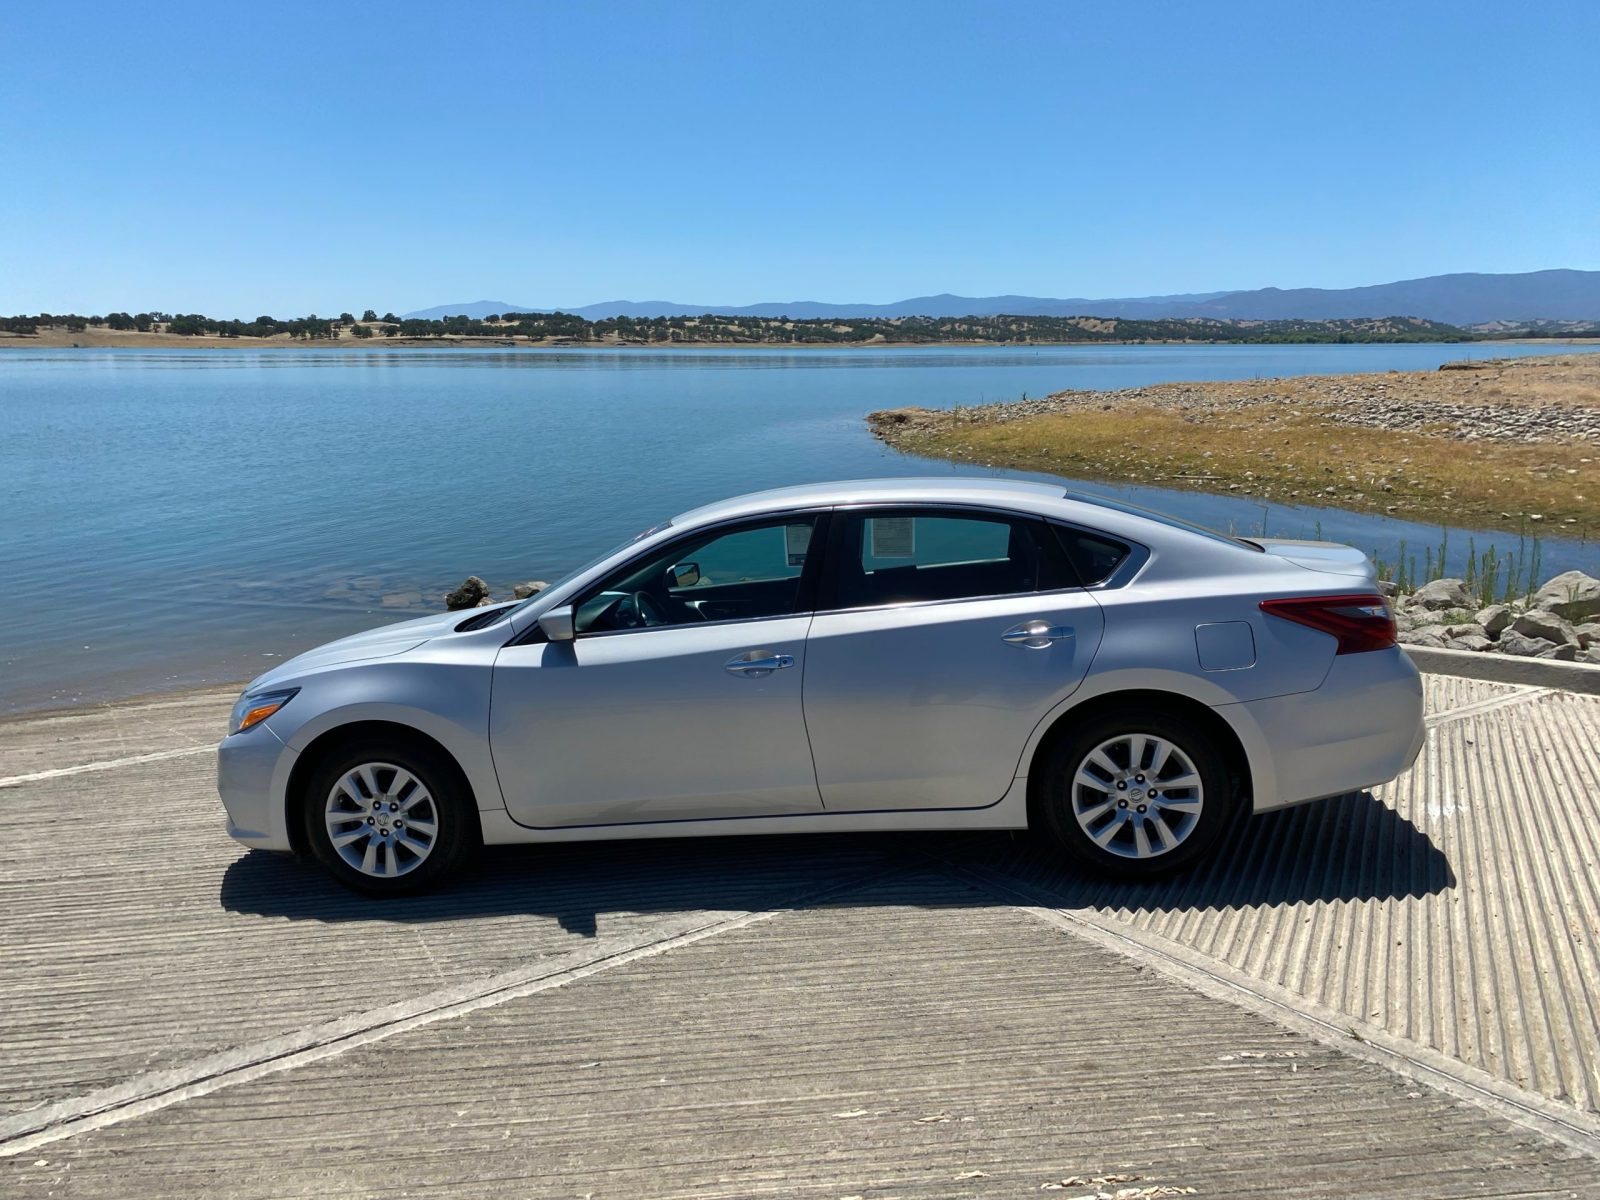 2018 Nissan Altima at Black Butte Lake